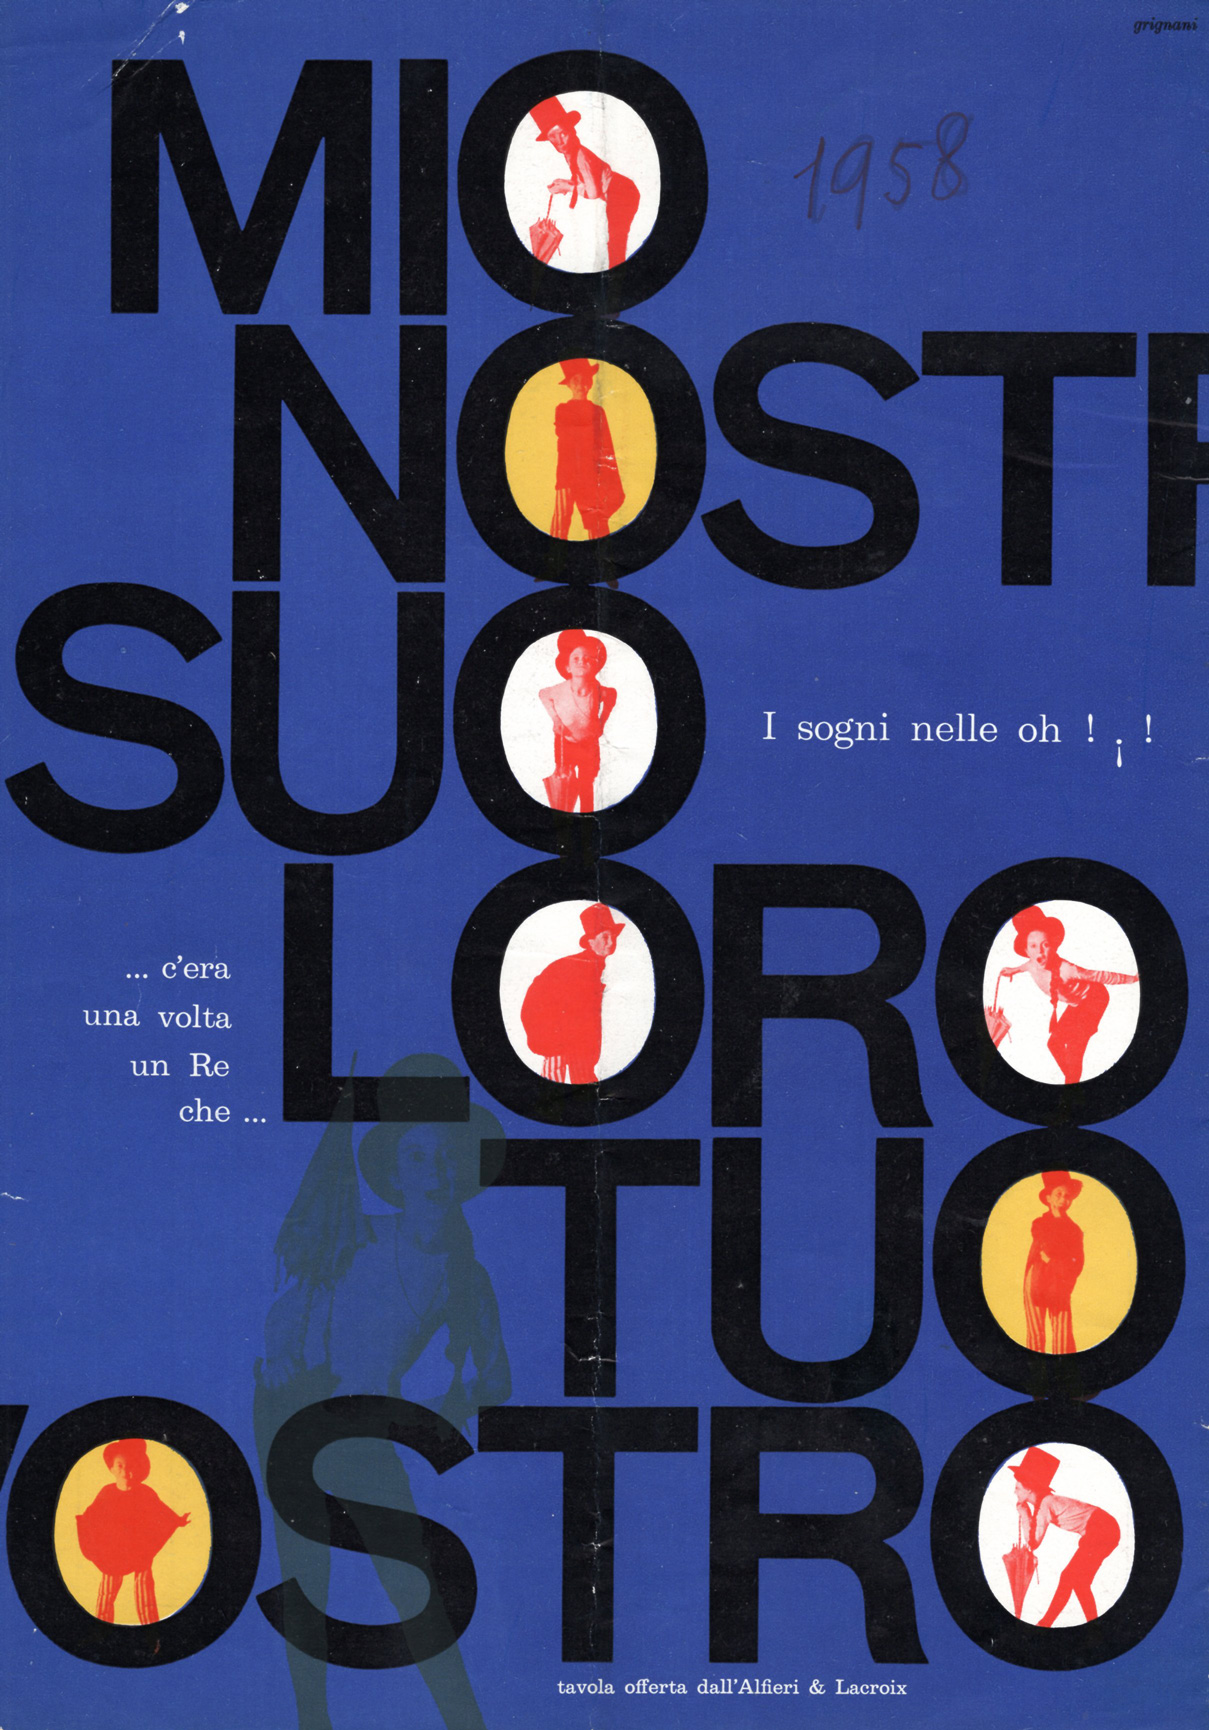 Franco Grignani, Ad for Alfieri & Lacroix, 1958